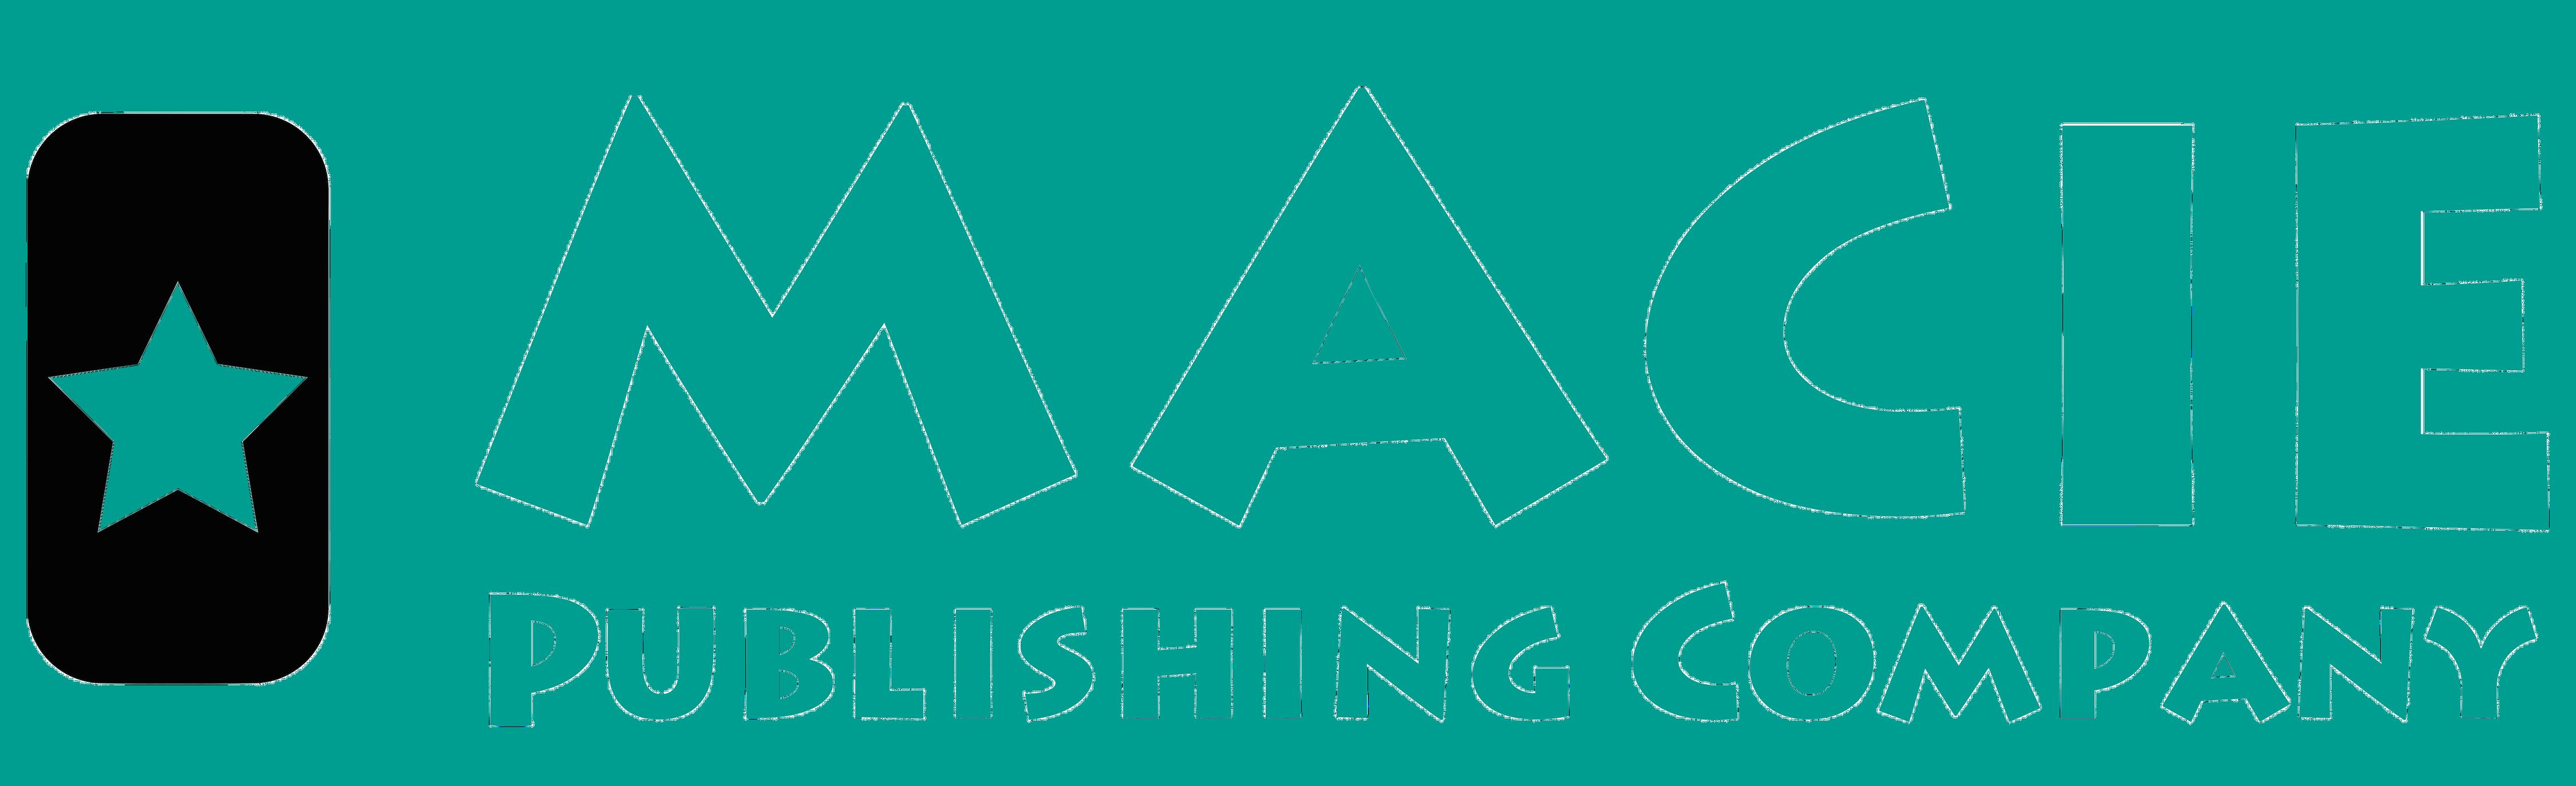 Macie Publishing Company